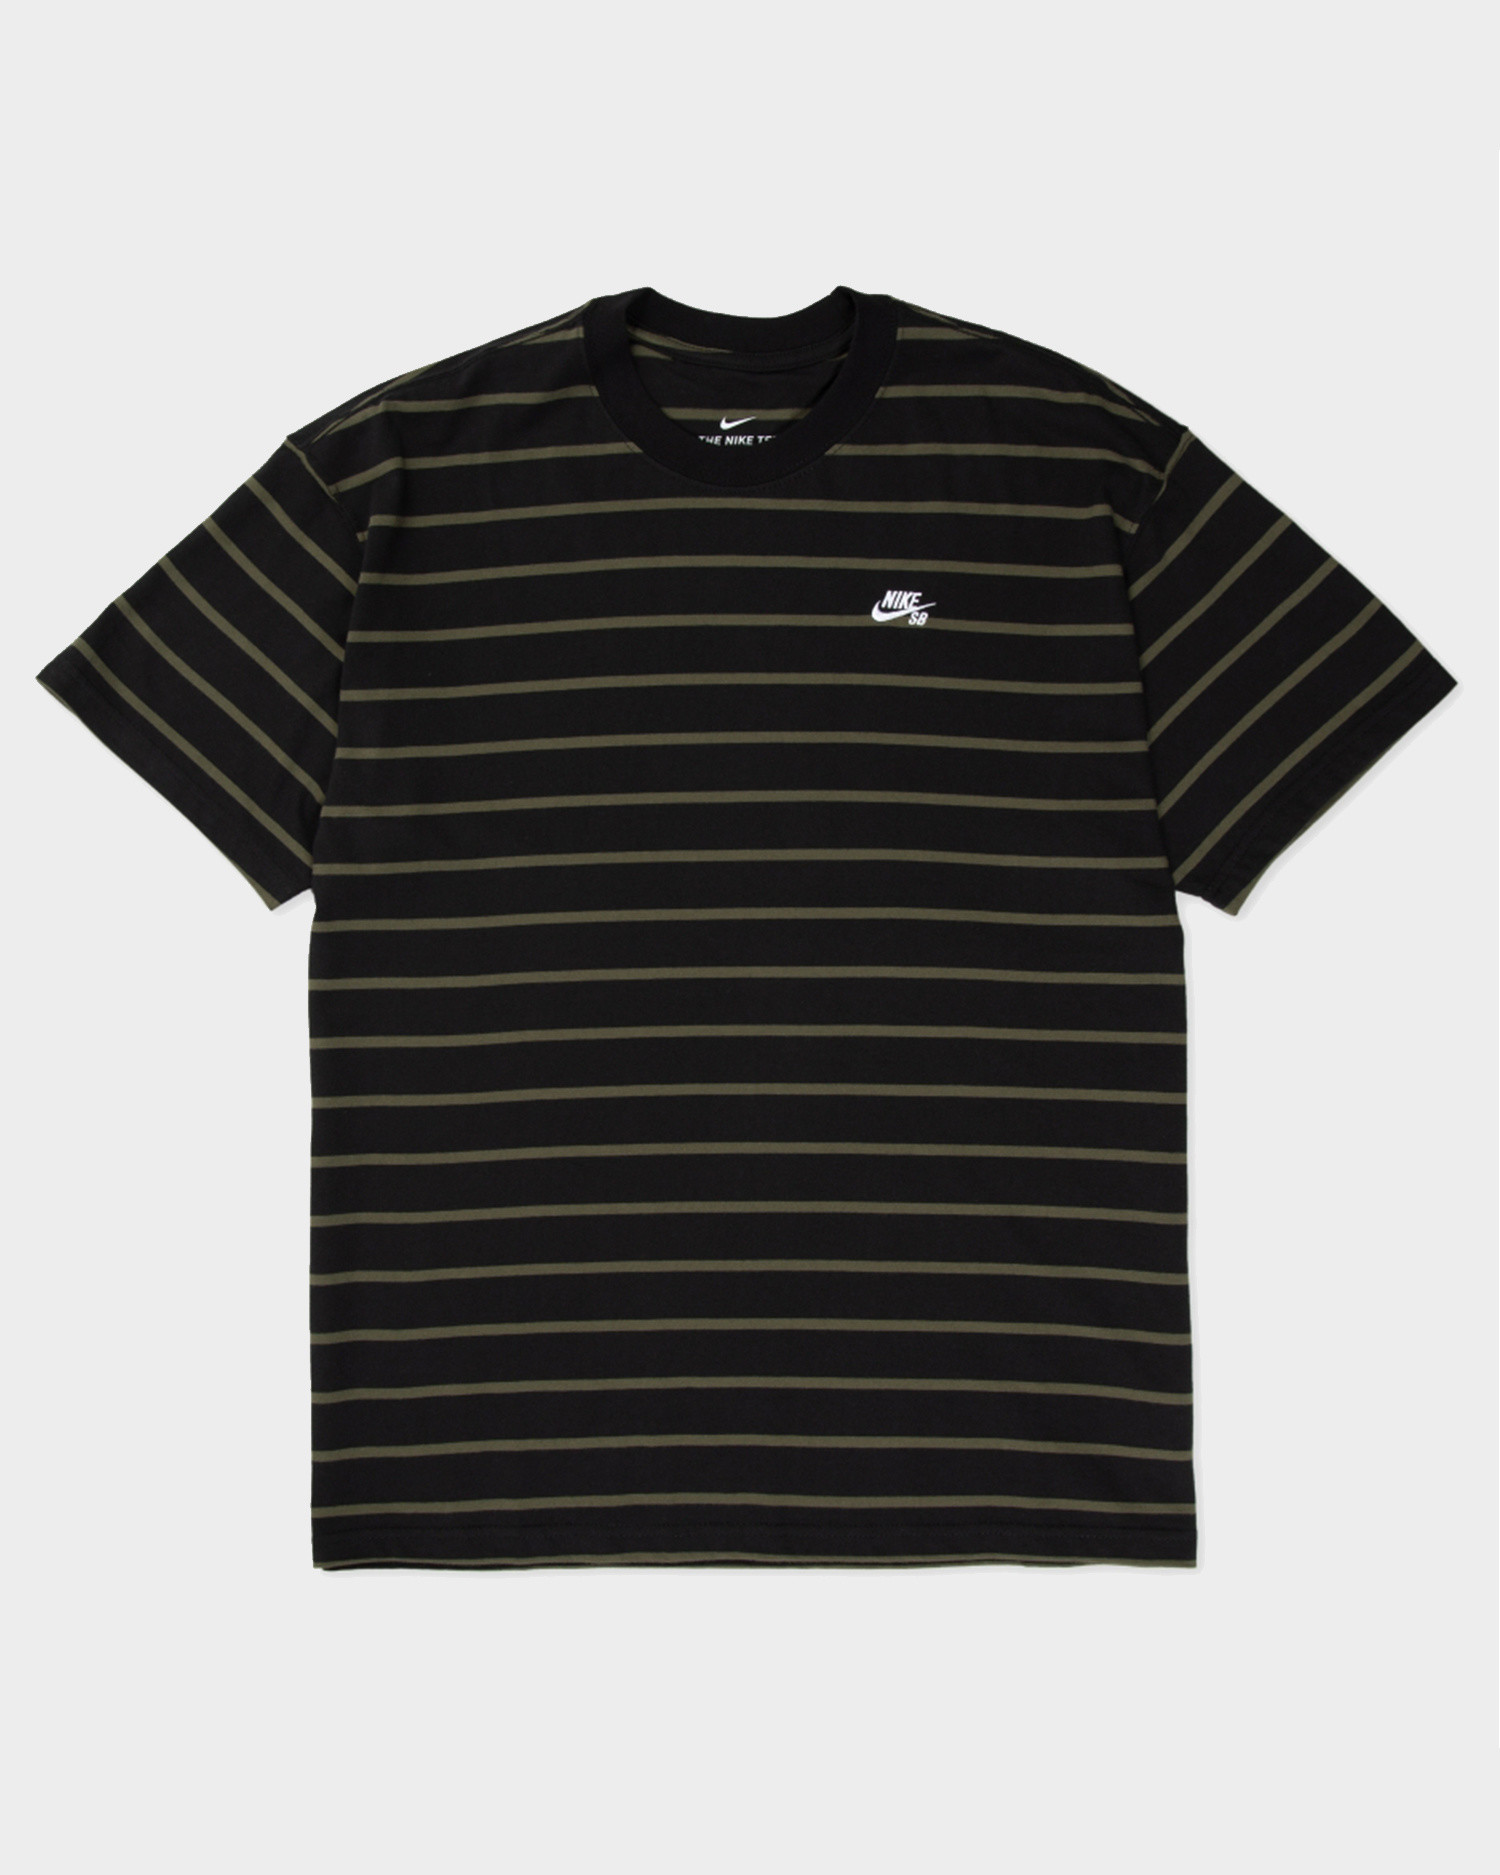 Nike Sb T Black/Cargo Khaki